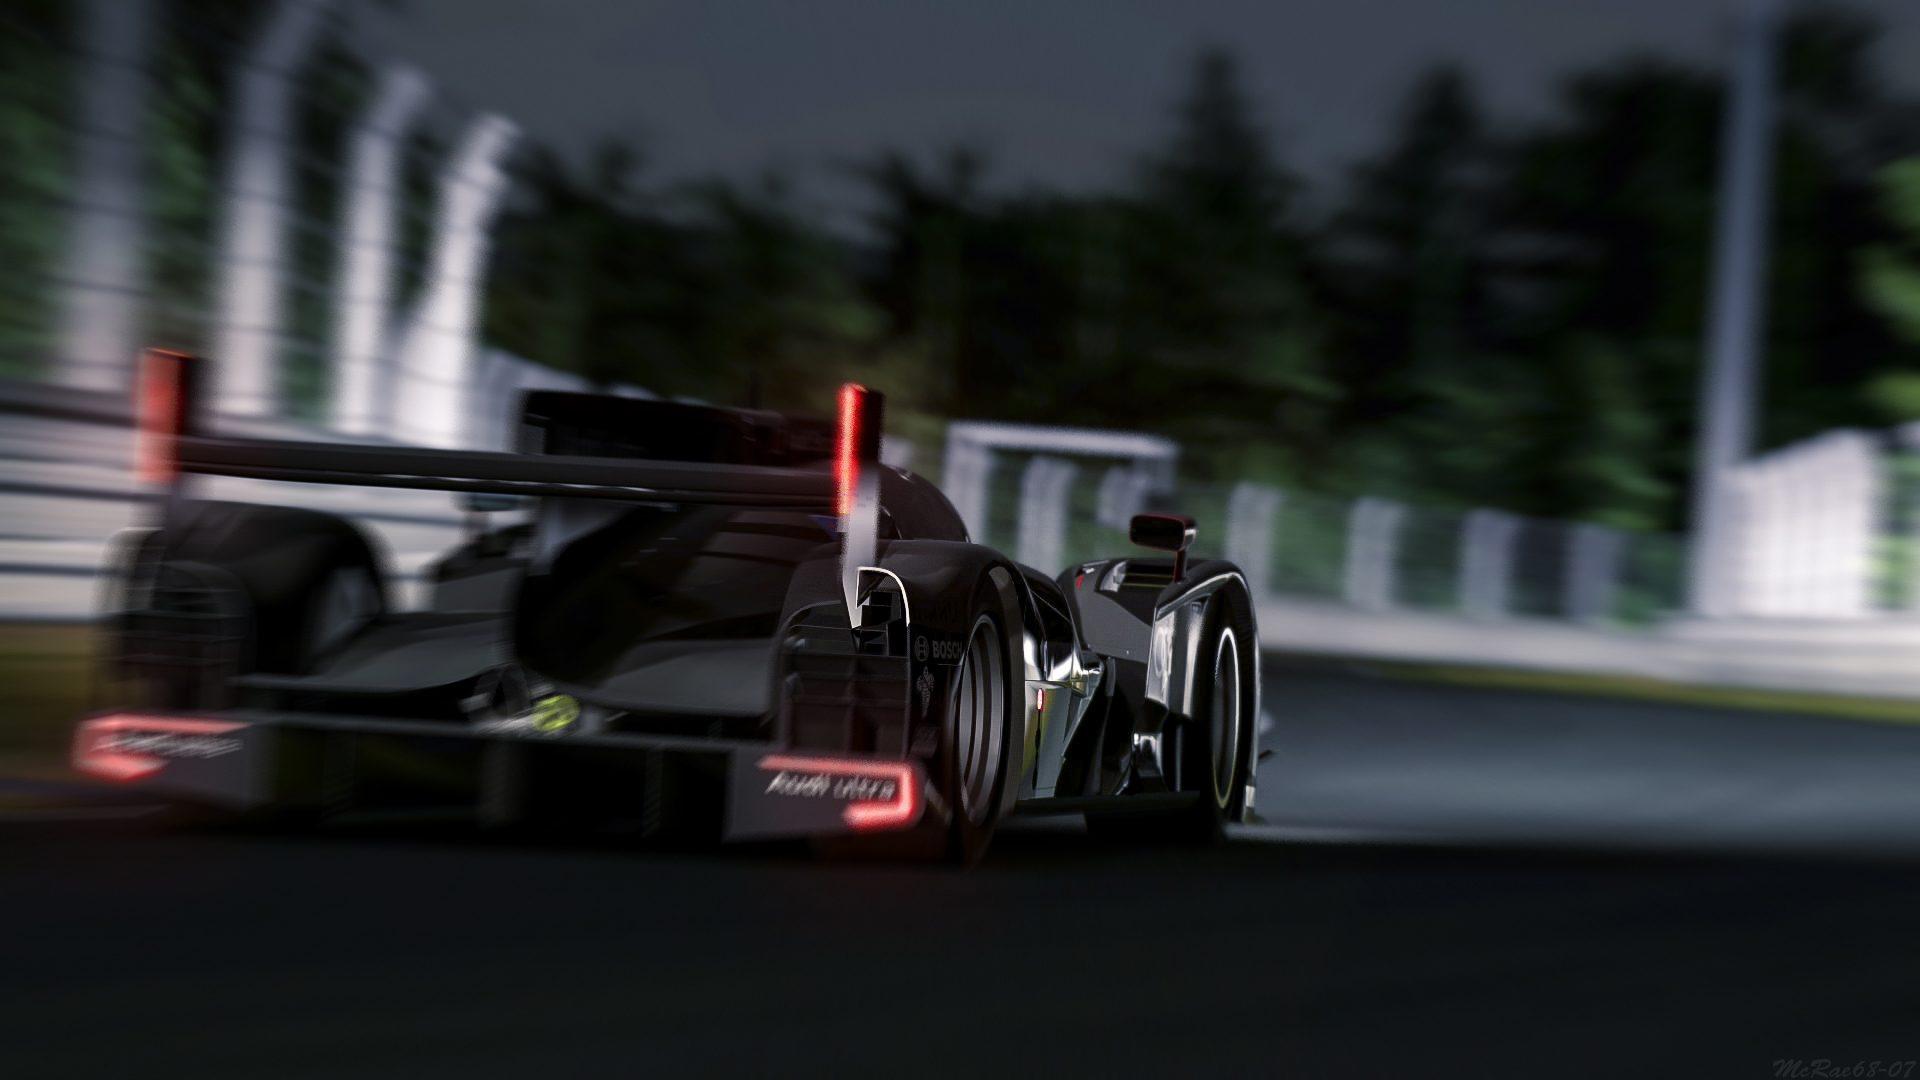 Circuit de la Sarthe 2013 R18 3.jpg